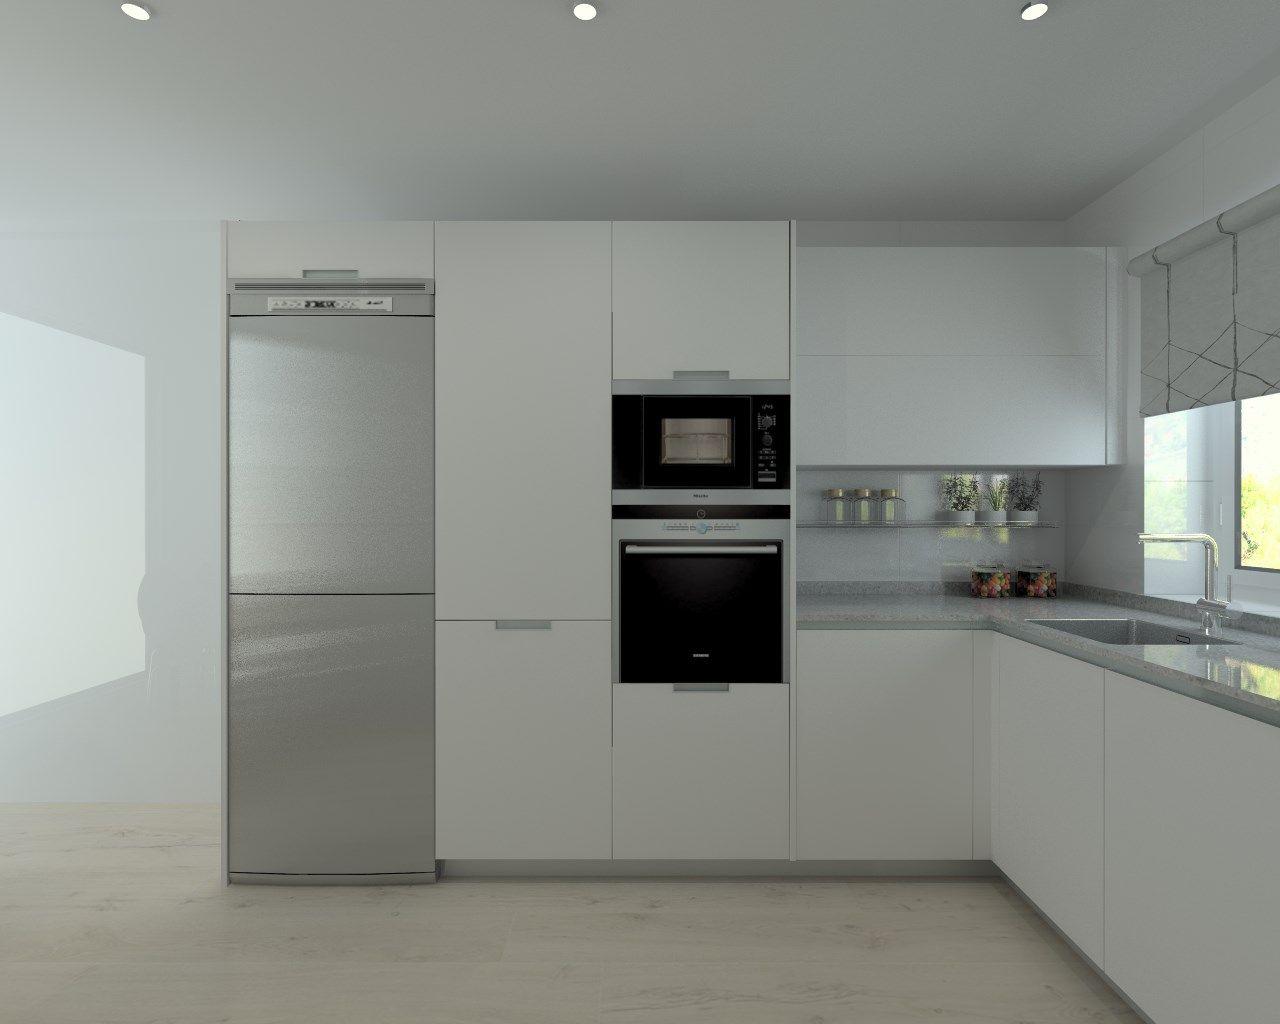 Proyectos de cocina en madrid kitchens high tech and for Proyectos de cocina easy